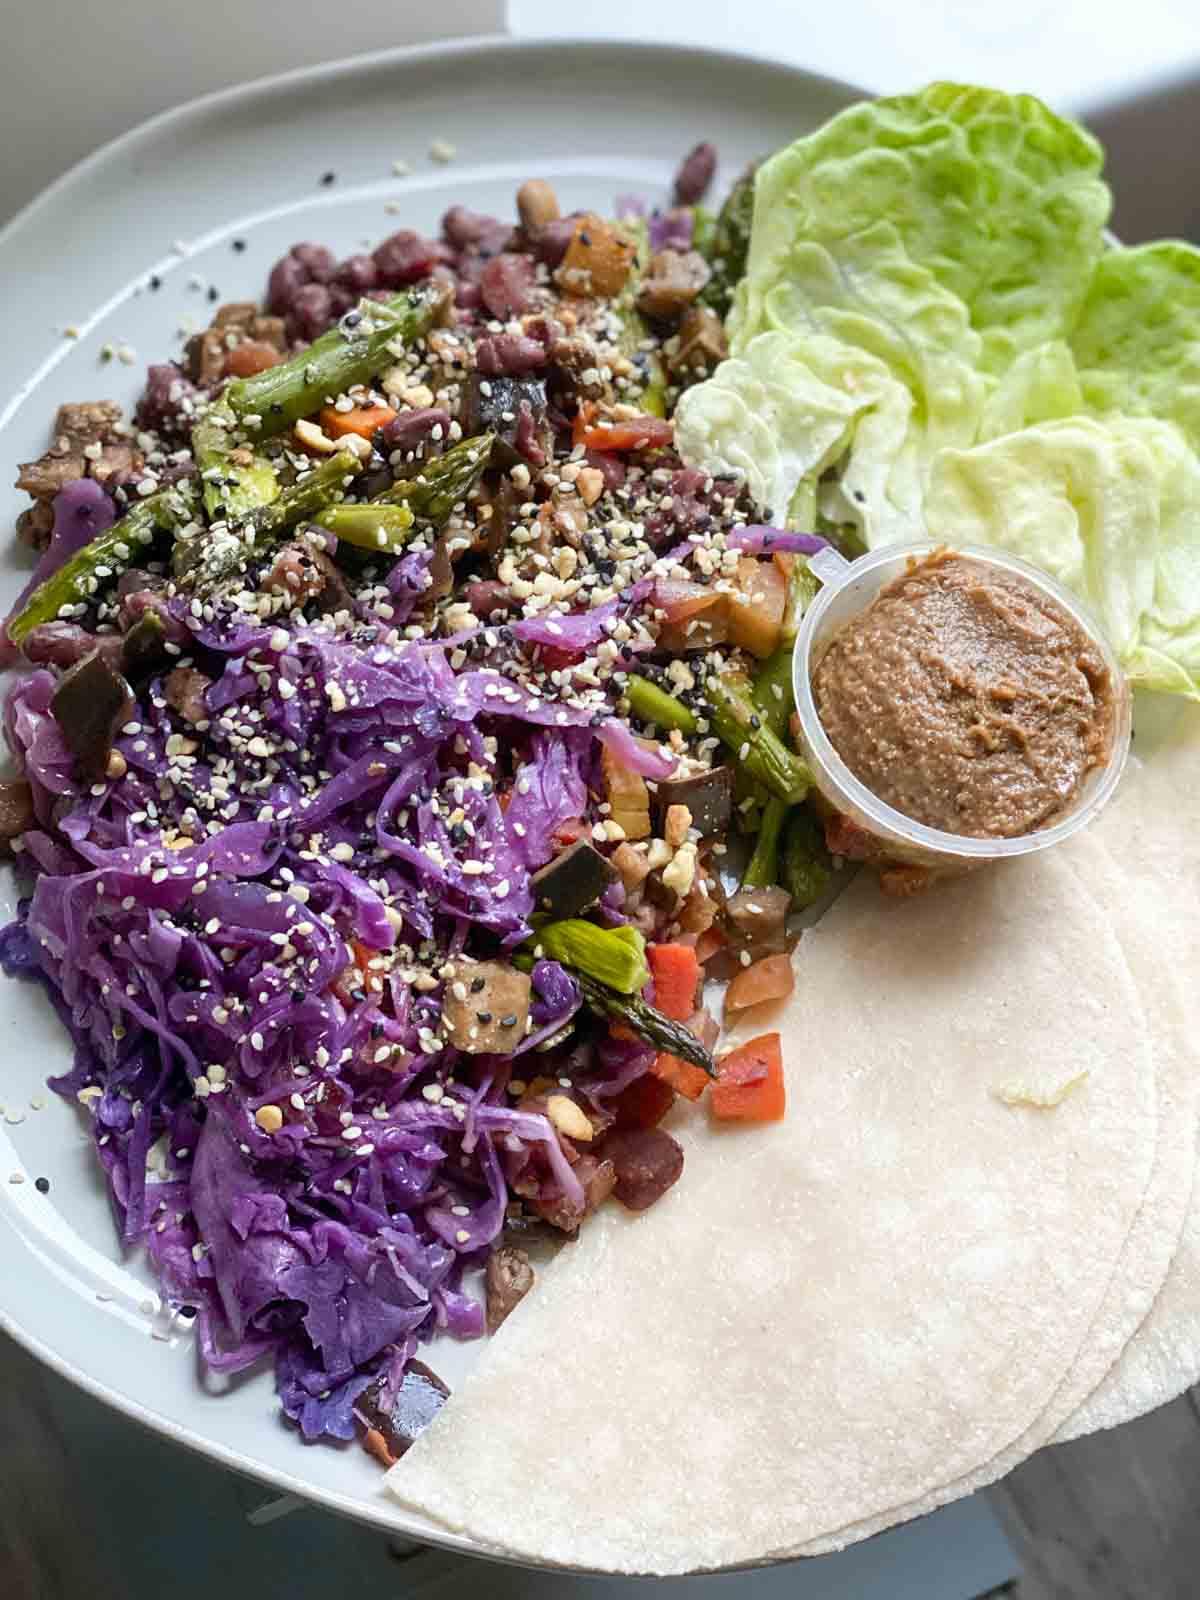 sakara lunch rainbow veggie moo shu wraps with tamarind sauce